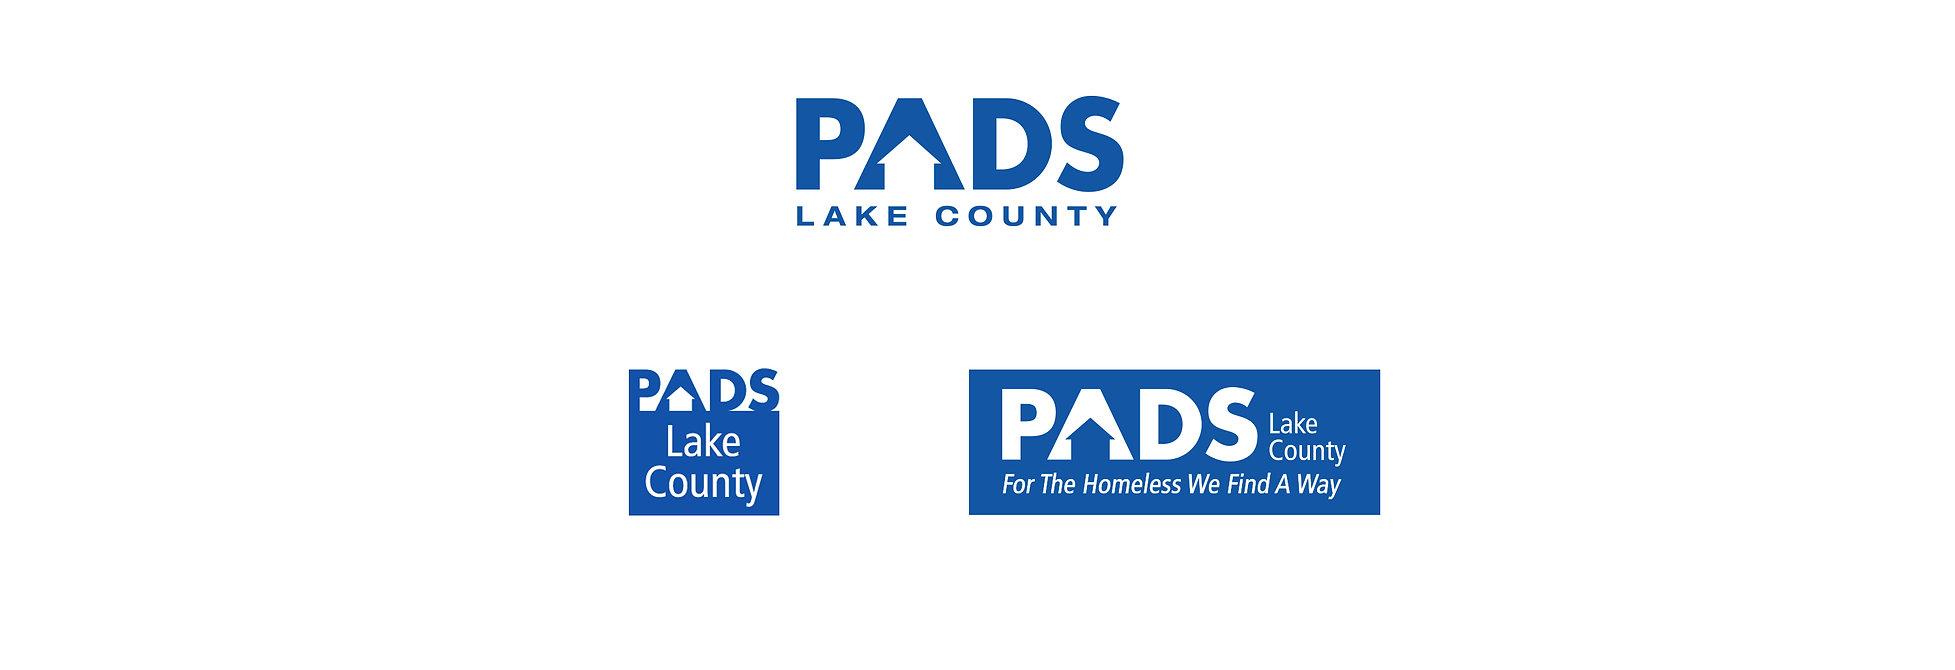 Pads Logos.jpg